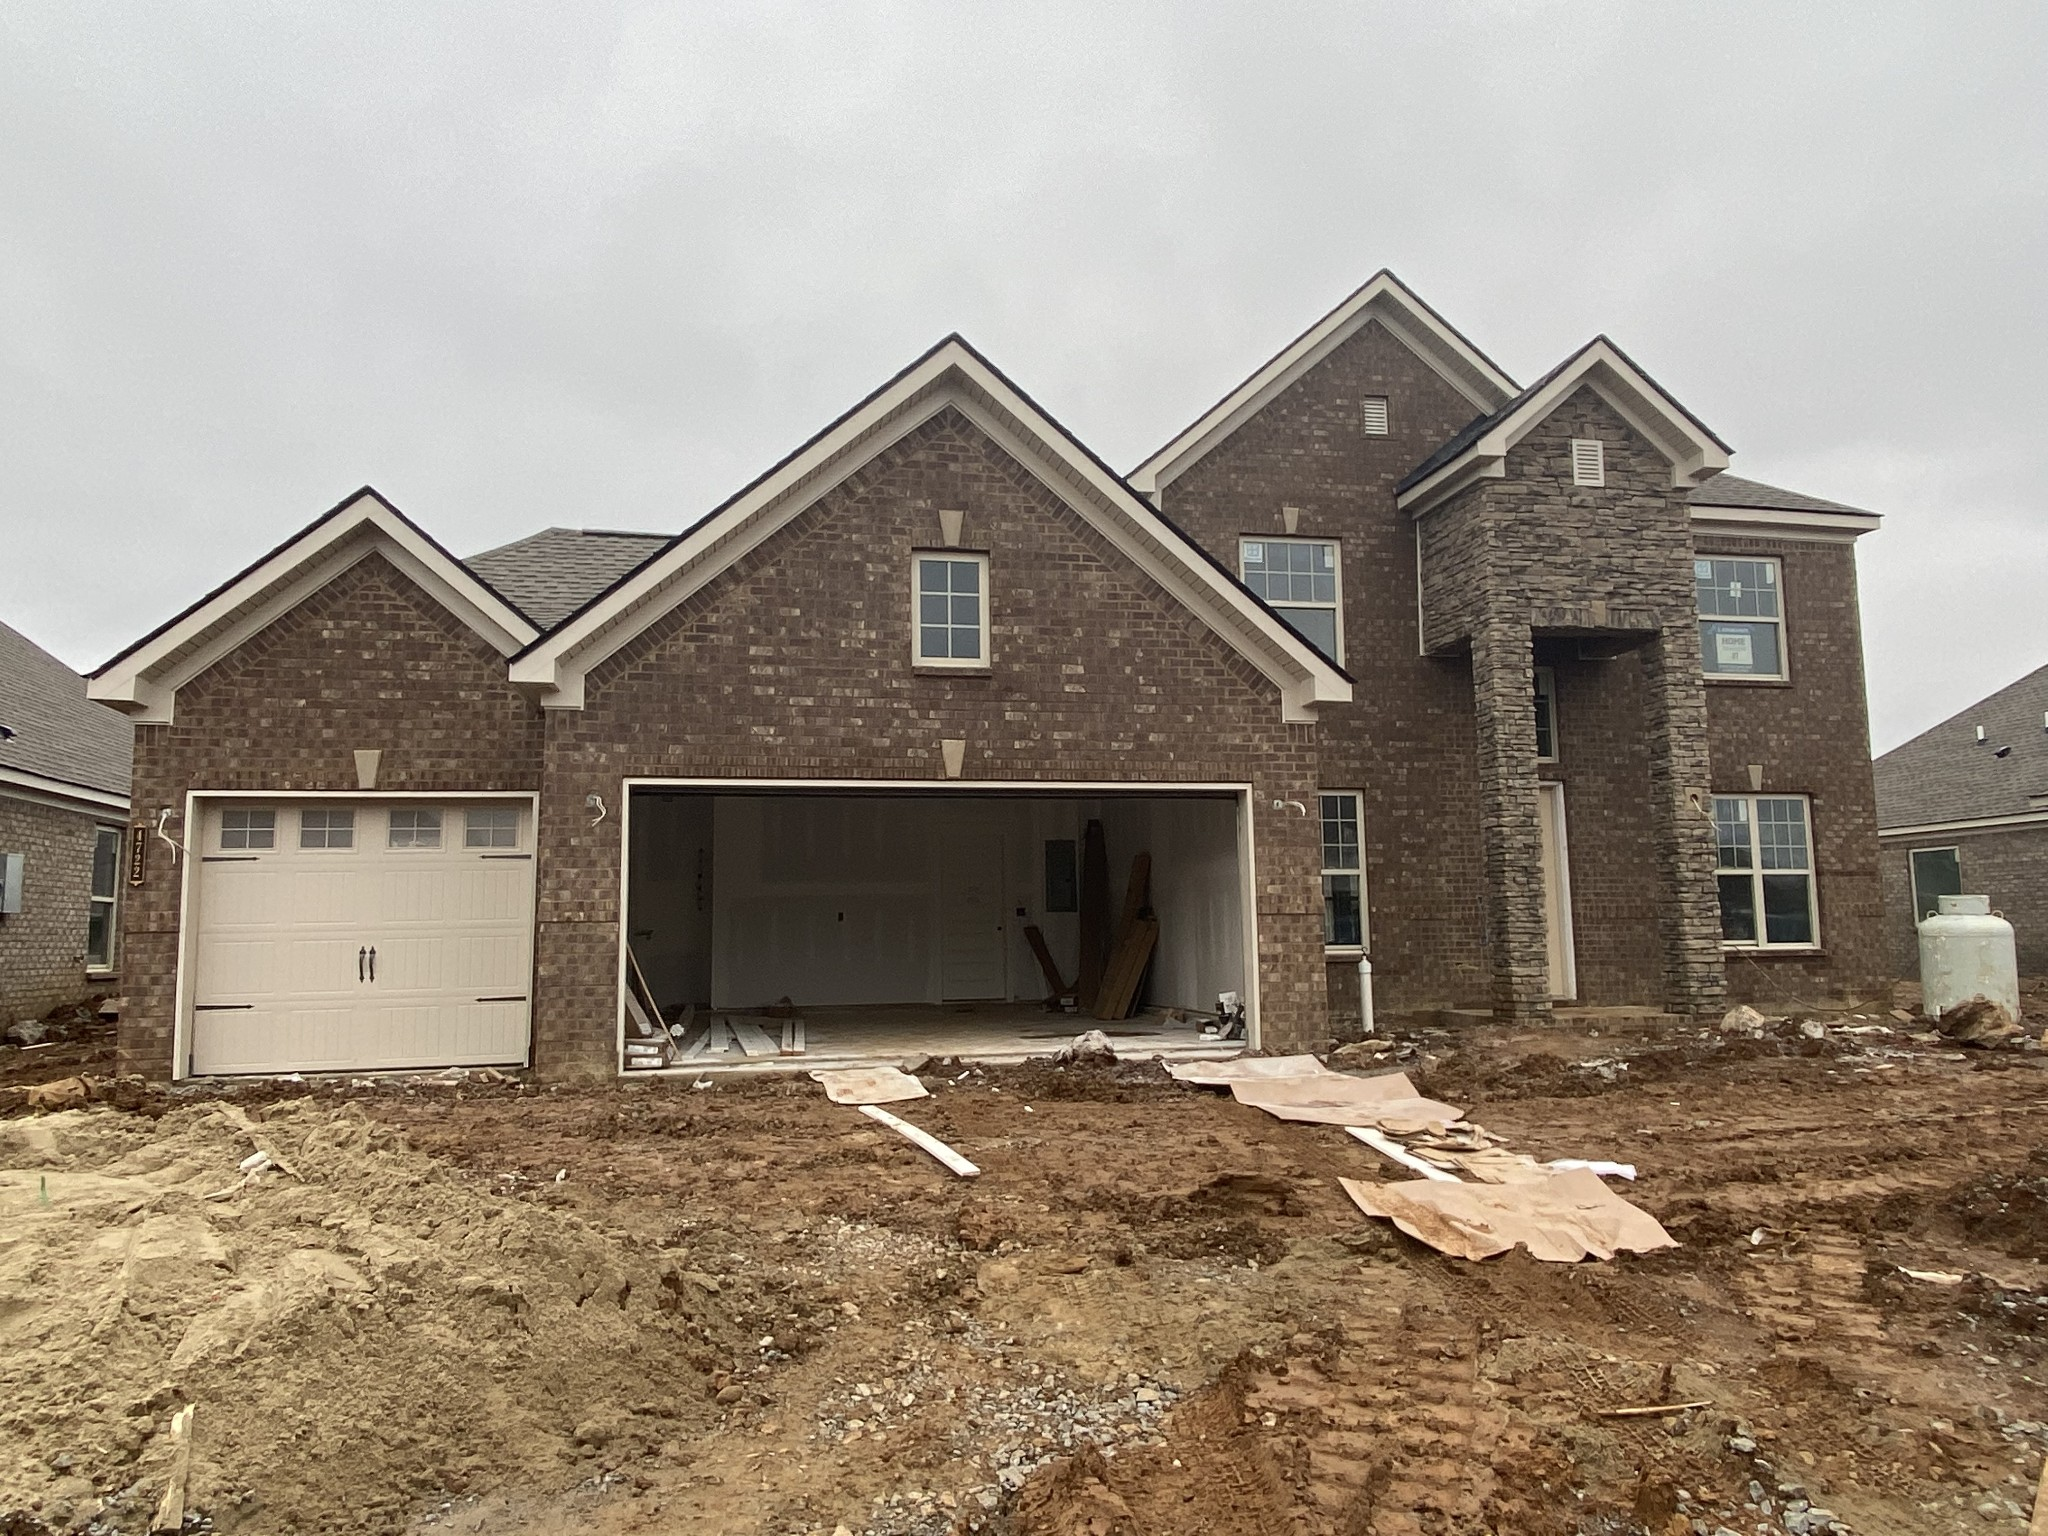 4722 Lapis Lane Lot 227P, Murfreesboro, TN 37128 - Murfreesboro, TN real estate listing